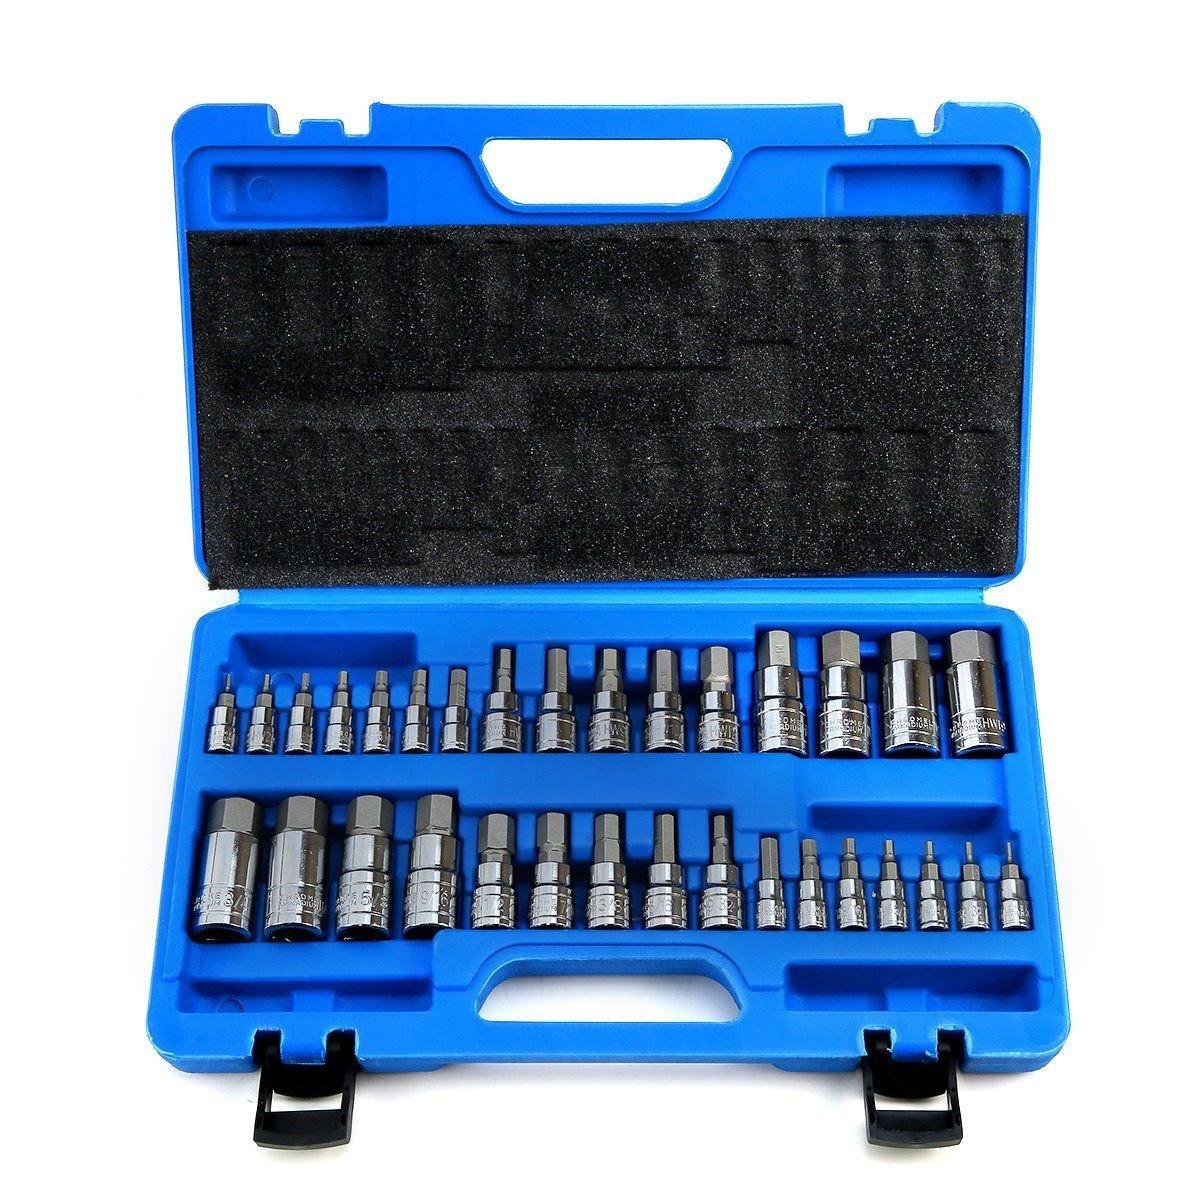 Master Hex Bit Set 32 pcs SAE Metric Socket Set Standard Allen S2 Steel 1/4'' 3/8''